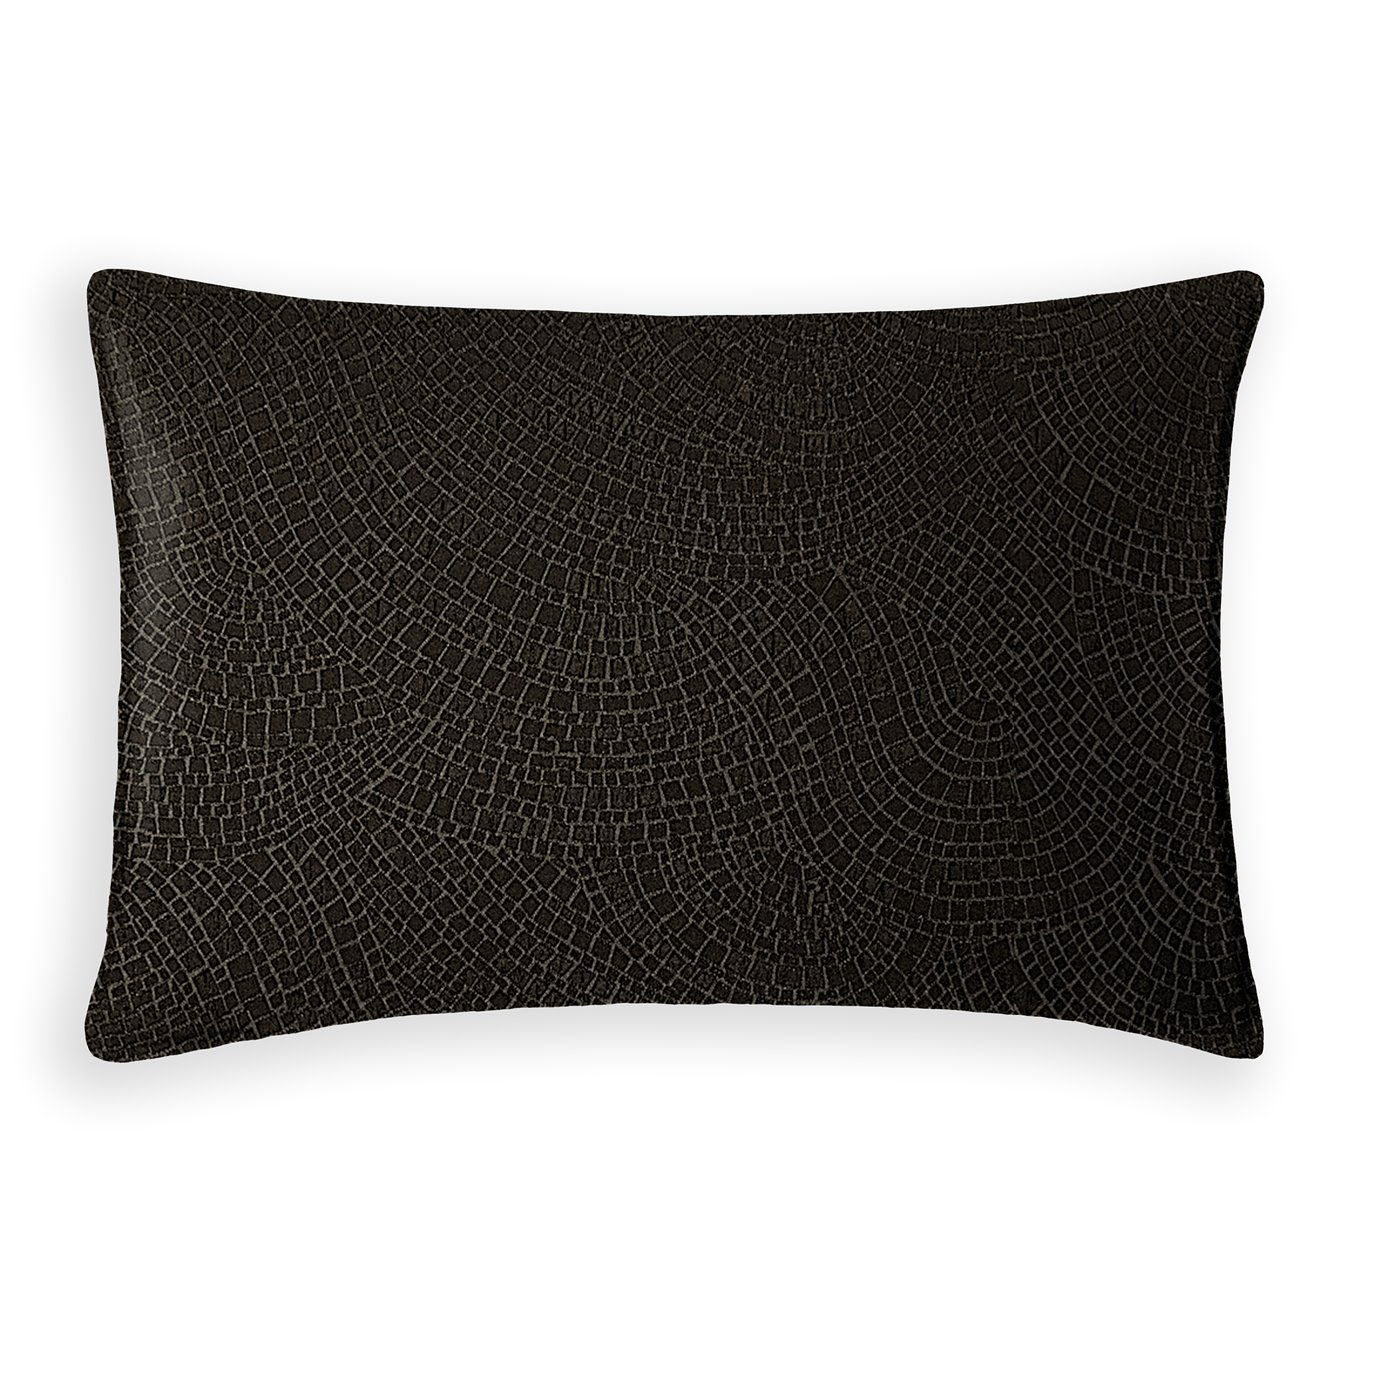 Hickory Lane Pillow Sham - King